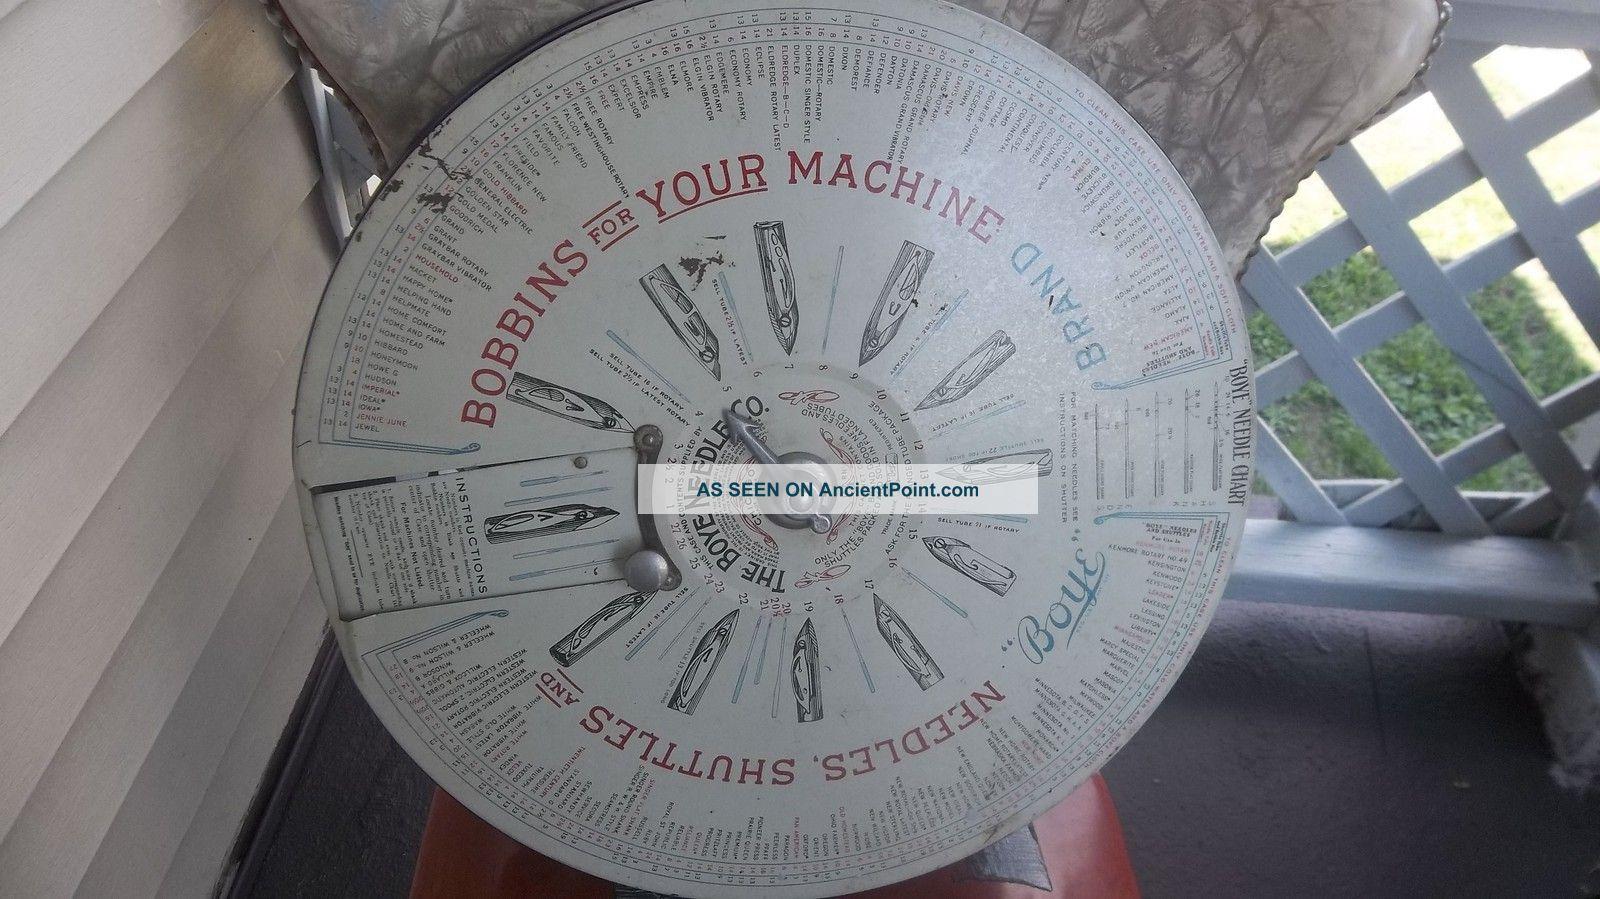 Antique Vintage Boye Co Metal Needle Case Display Rotary Dispenser Needles & Cases photo